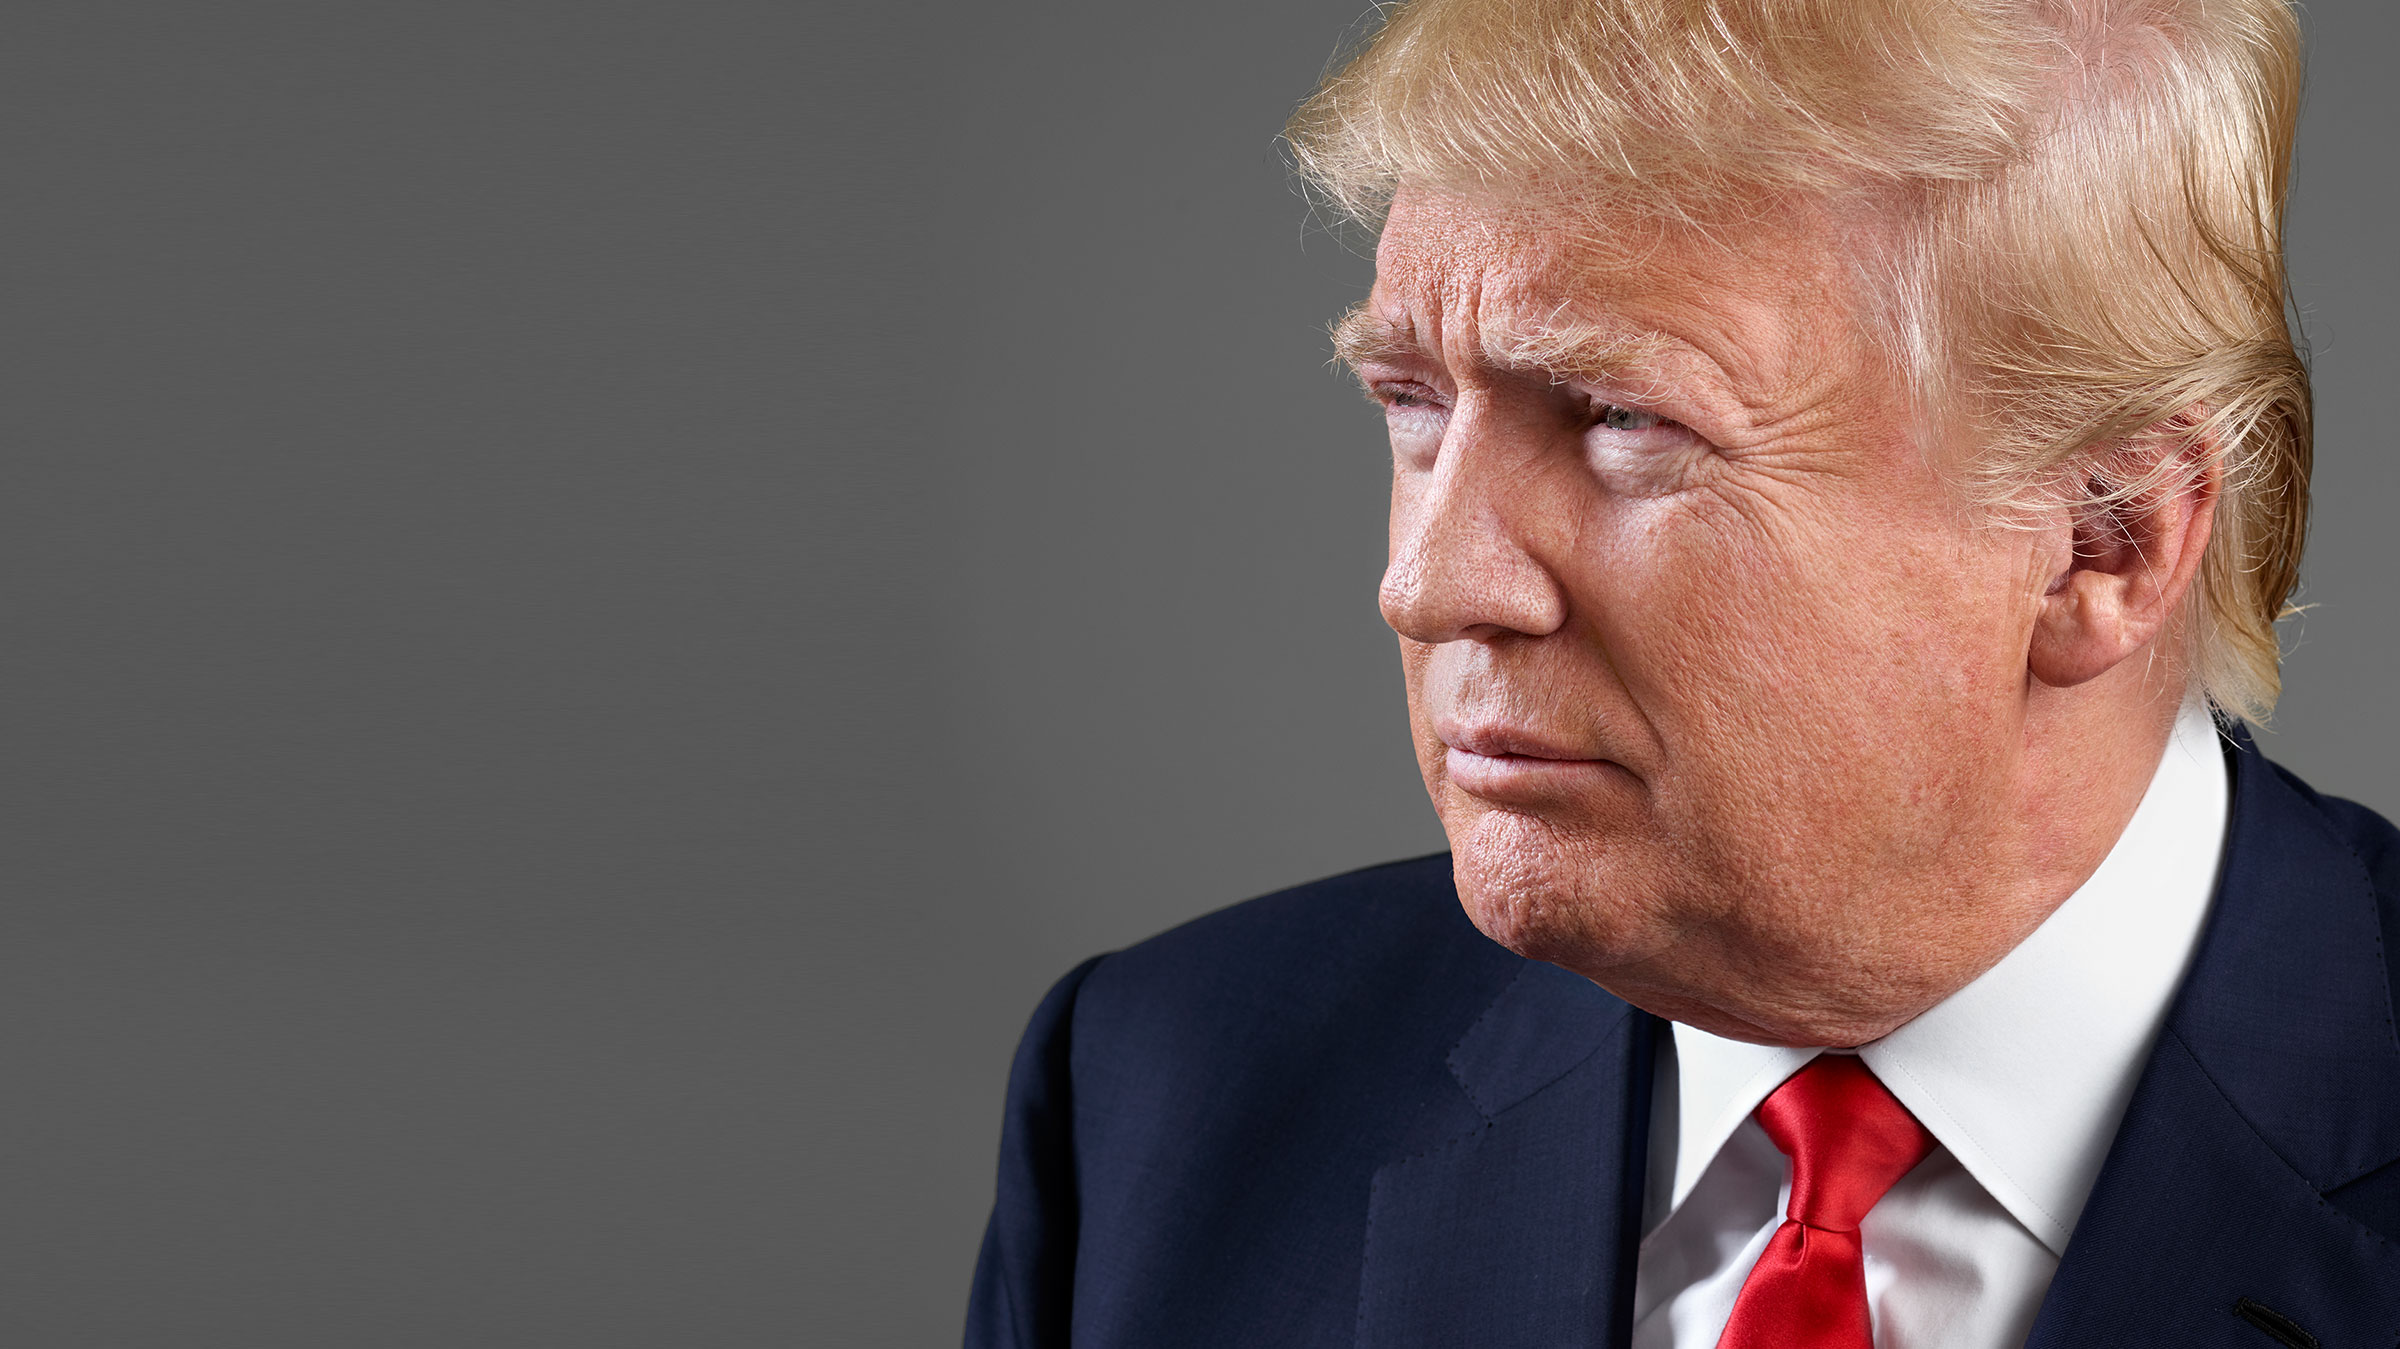 US President Donald Trump attacks media for coverage of Russia case